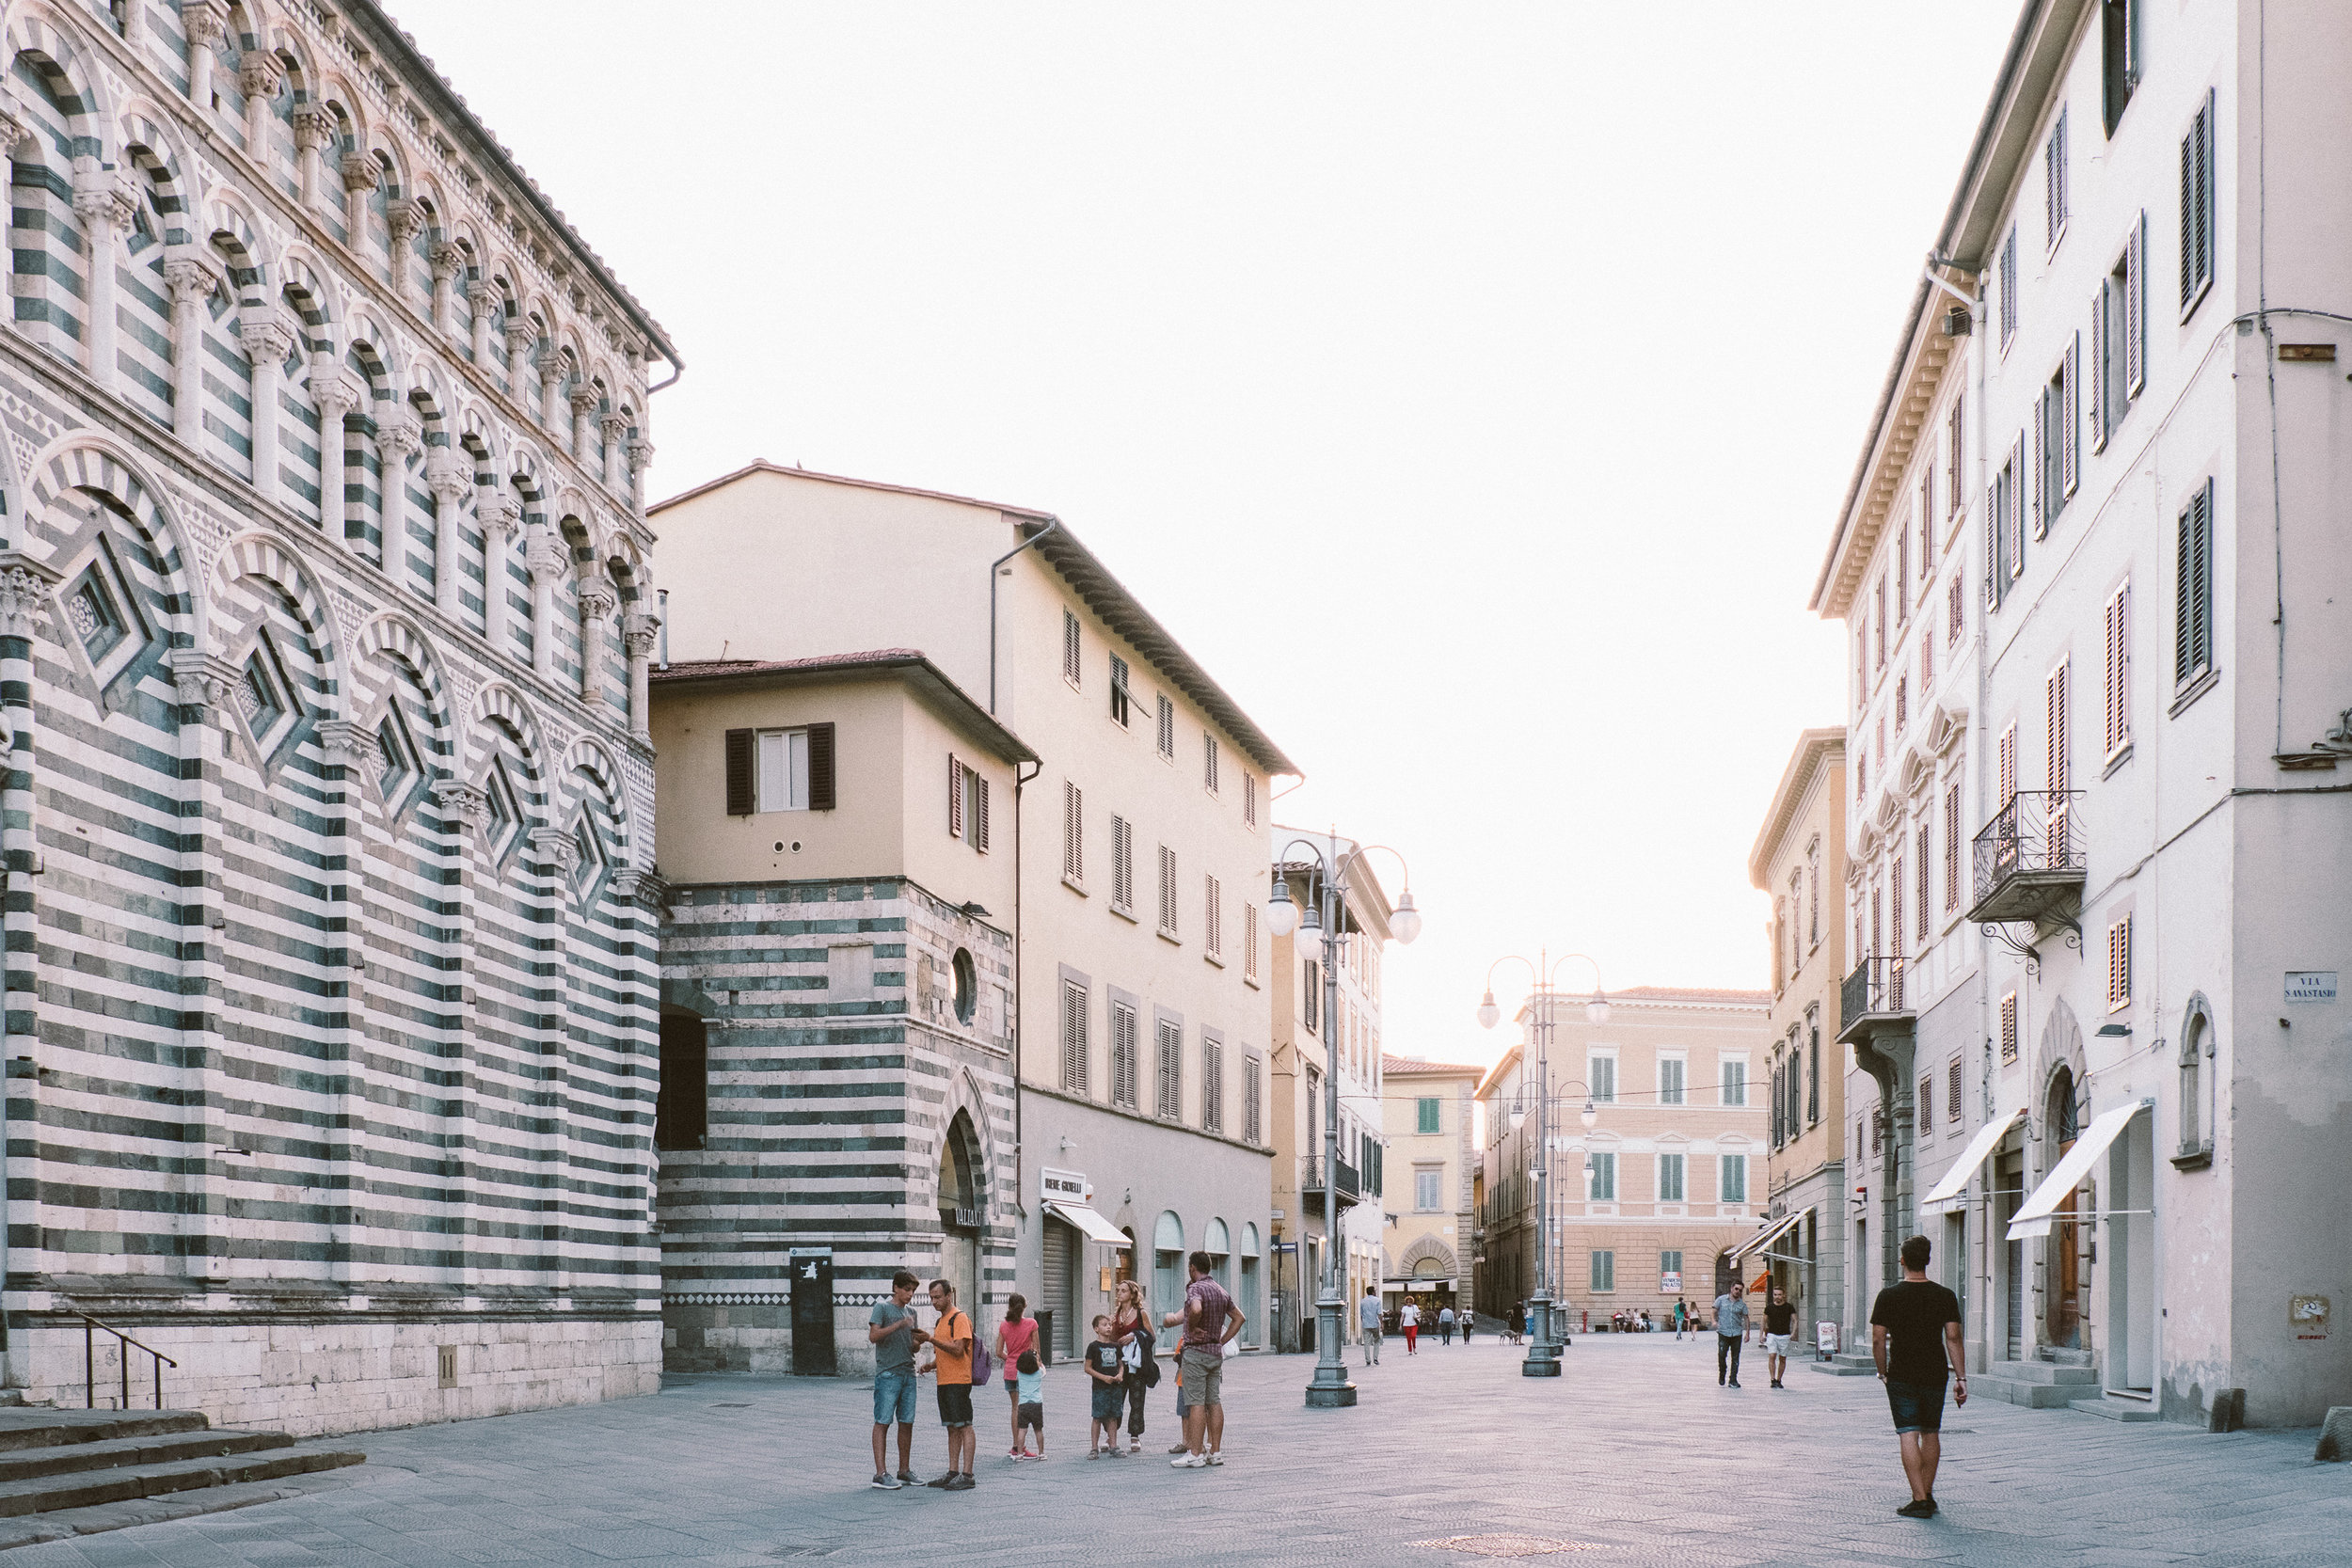 fat-creative-travel-blog-pistoia-italian-capital-of-culture-2017-63.jpg